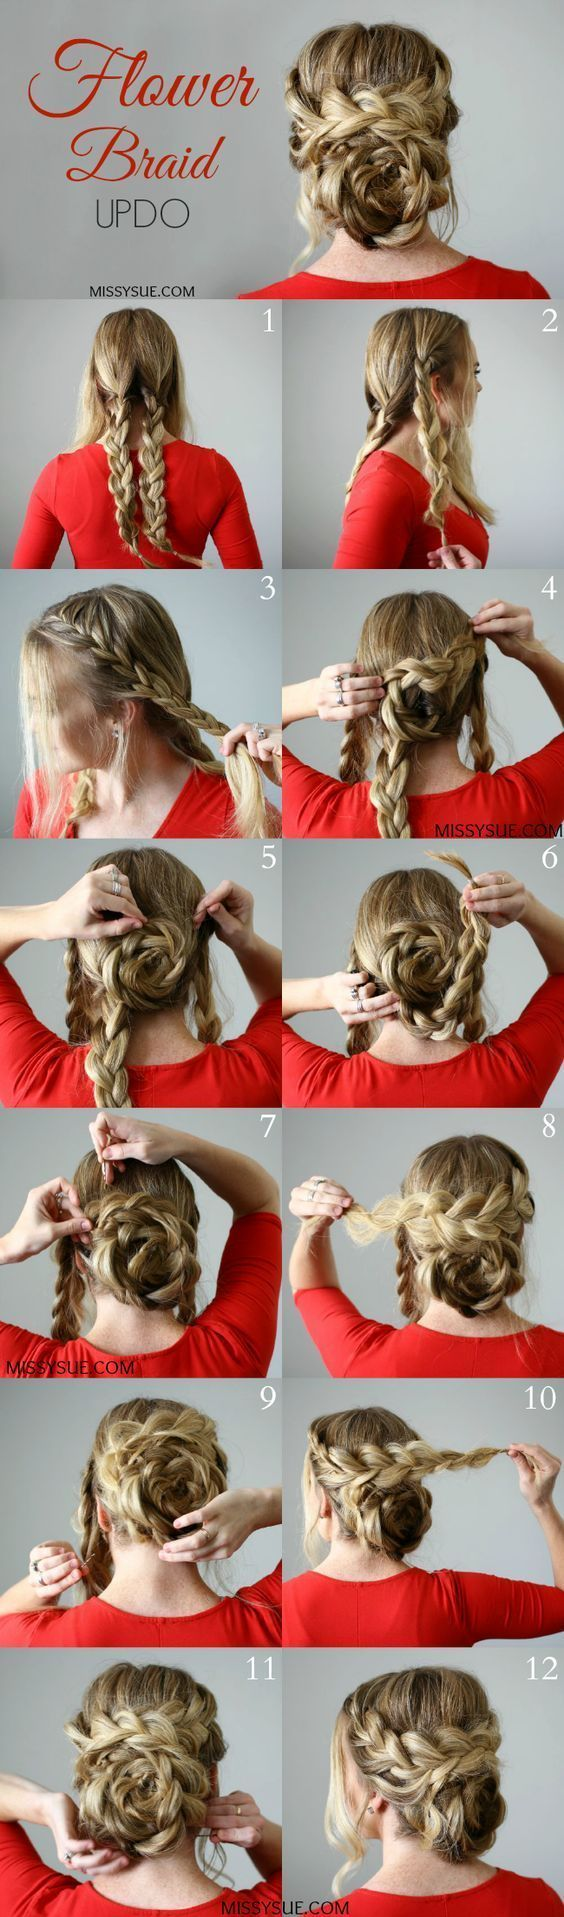 classic hairstyles flower braid